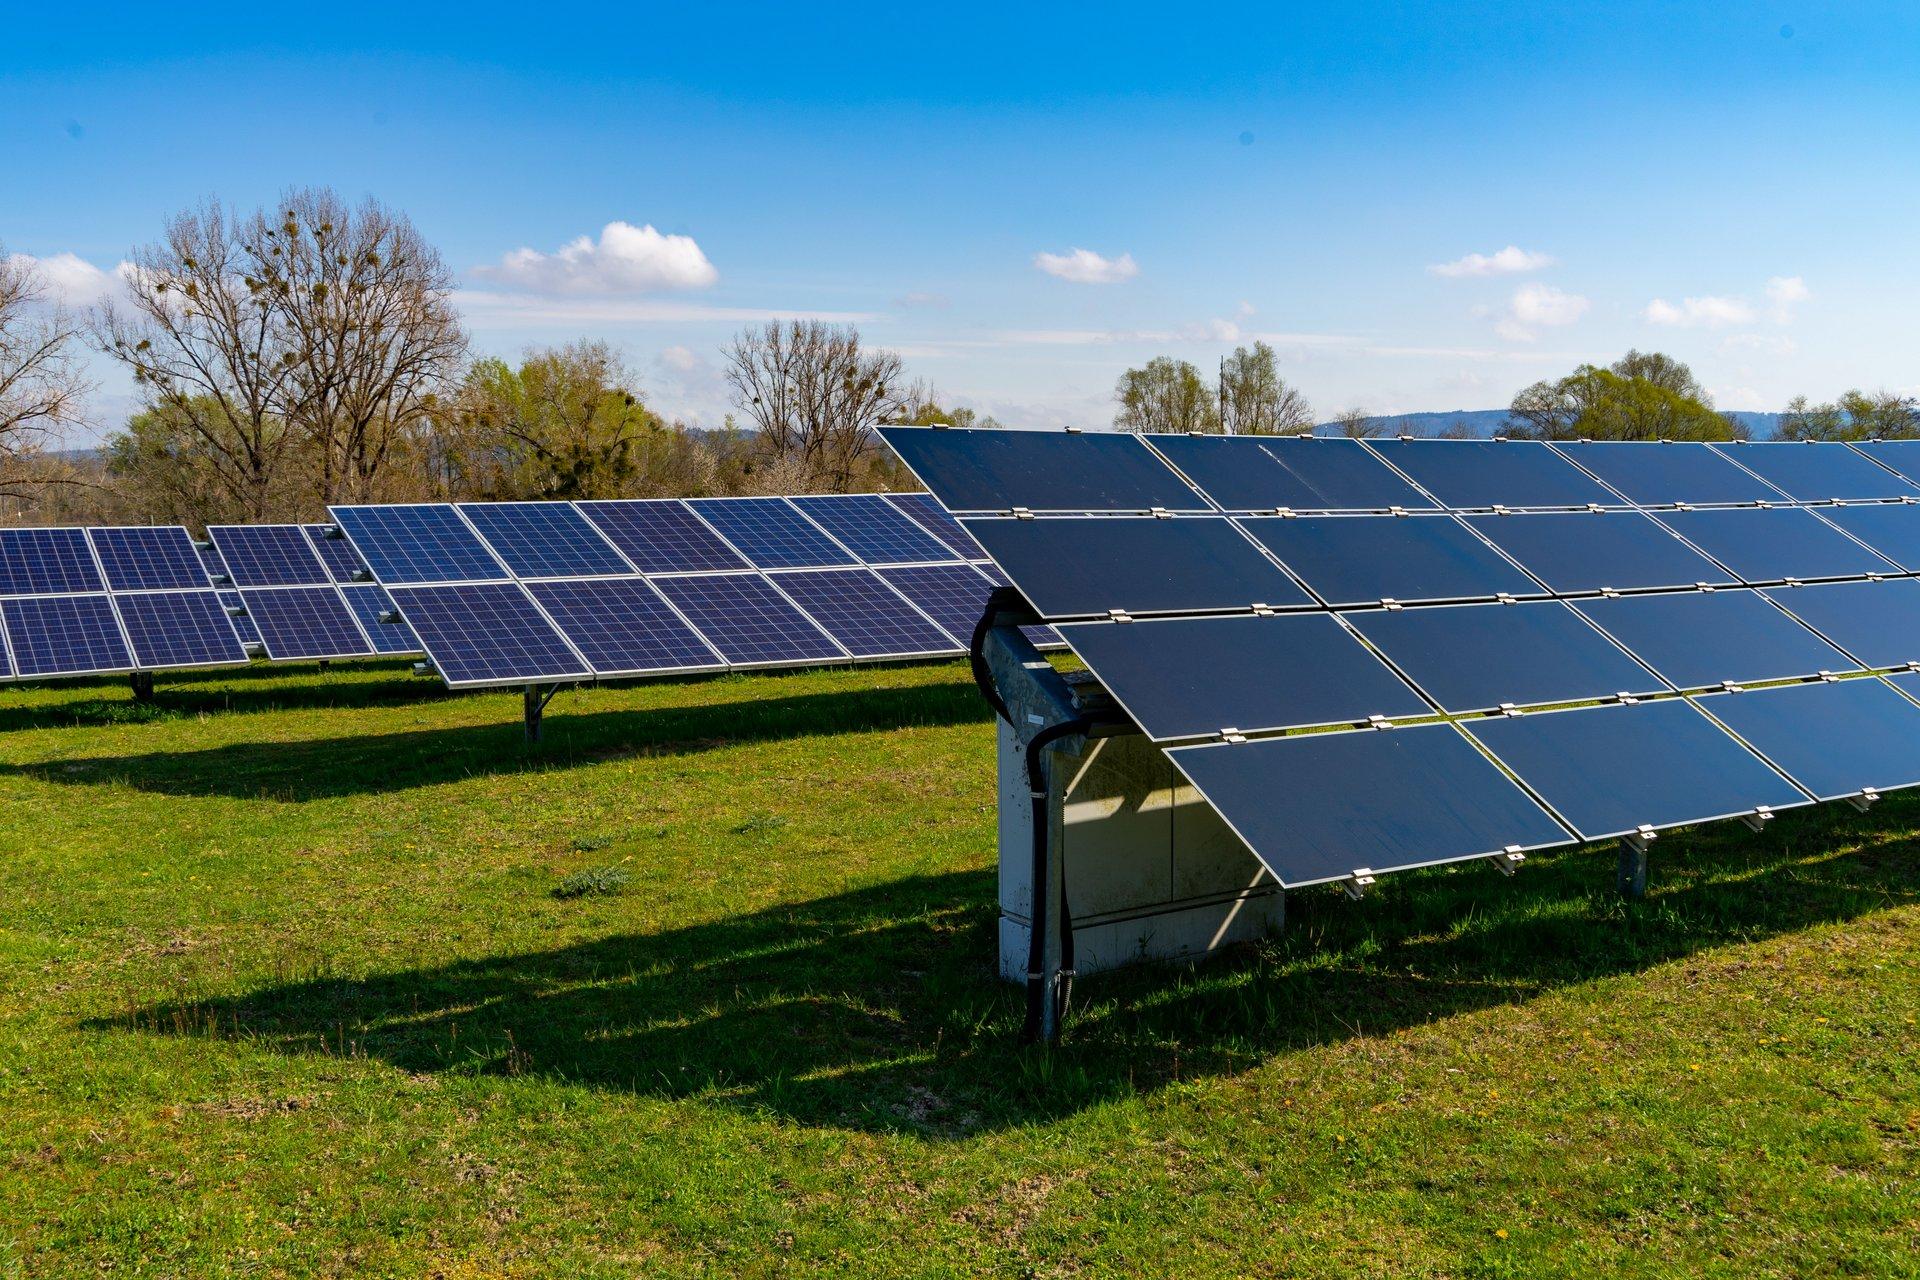 Foto: Solarpark Rickelshausen in Baden-Württemberg, © Plattform EE BW, A. Jung